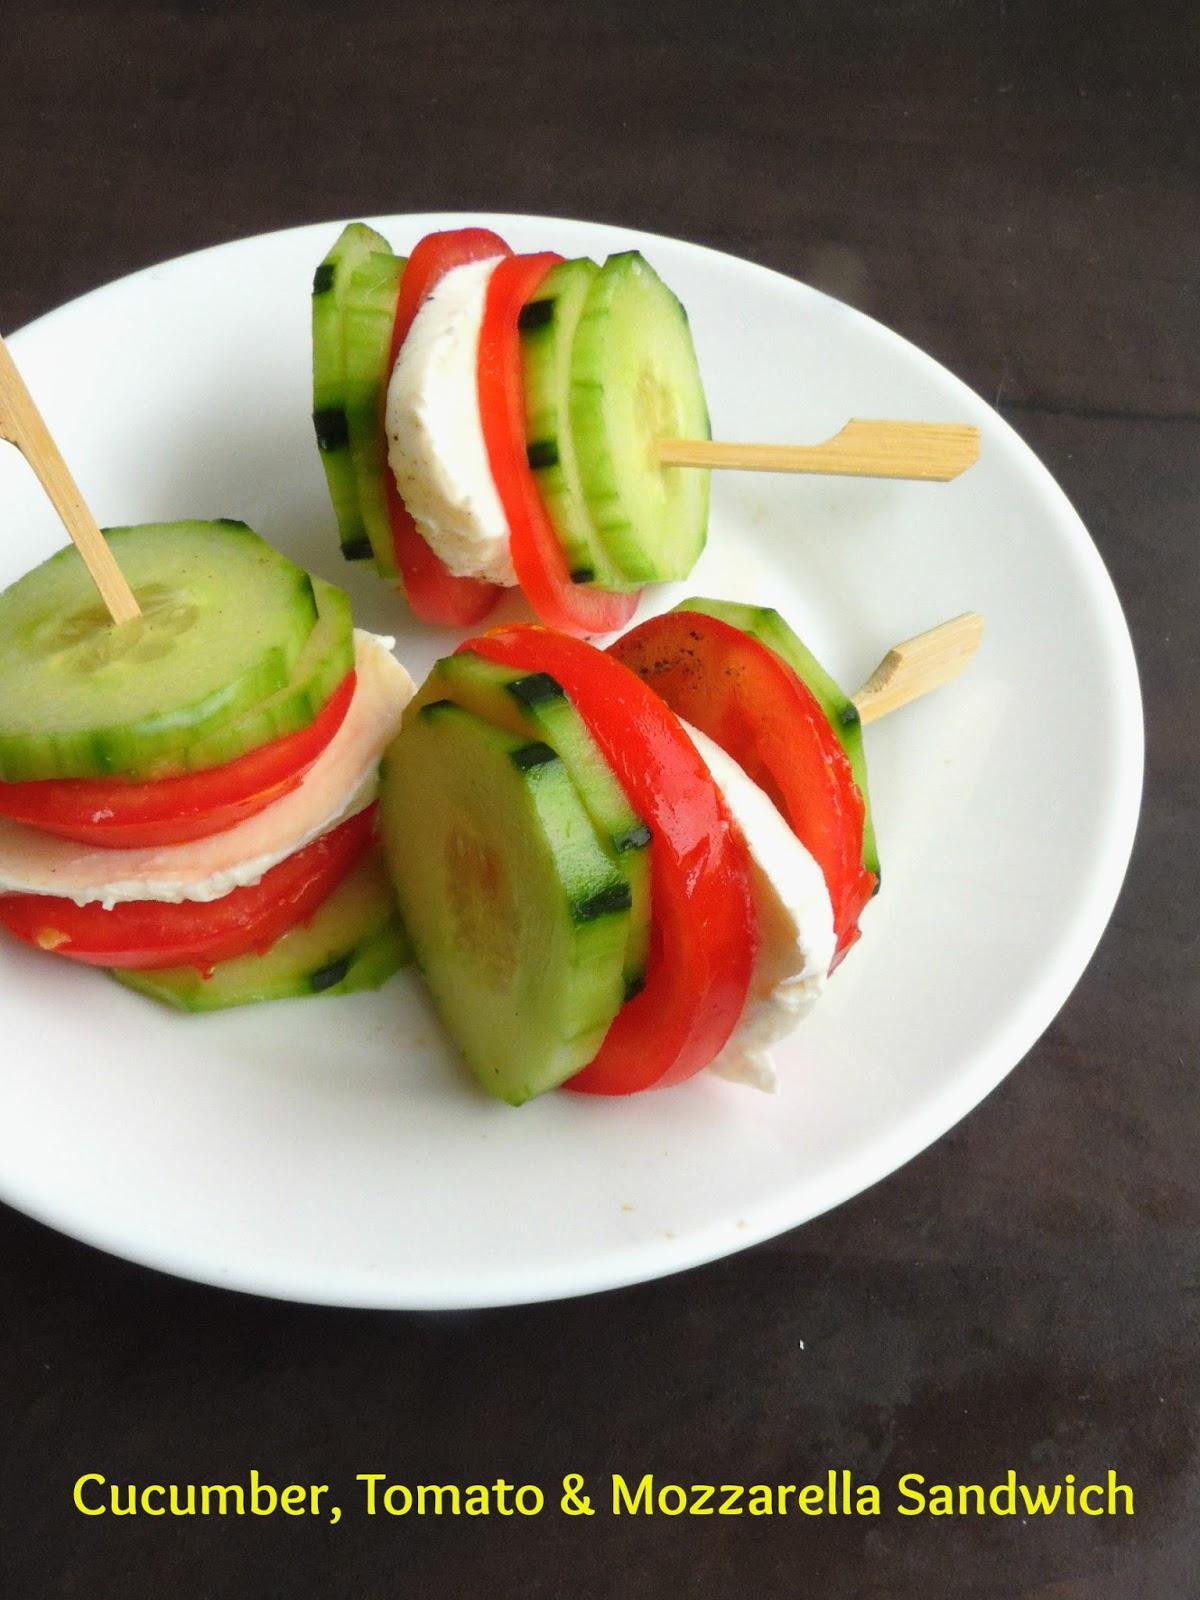 Priya's Versatile Recipes: Cucumber, Tomato & Mozzarella Sandwich